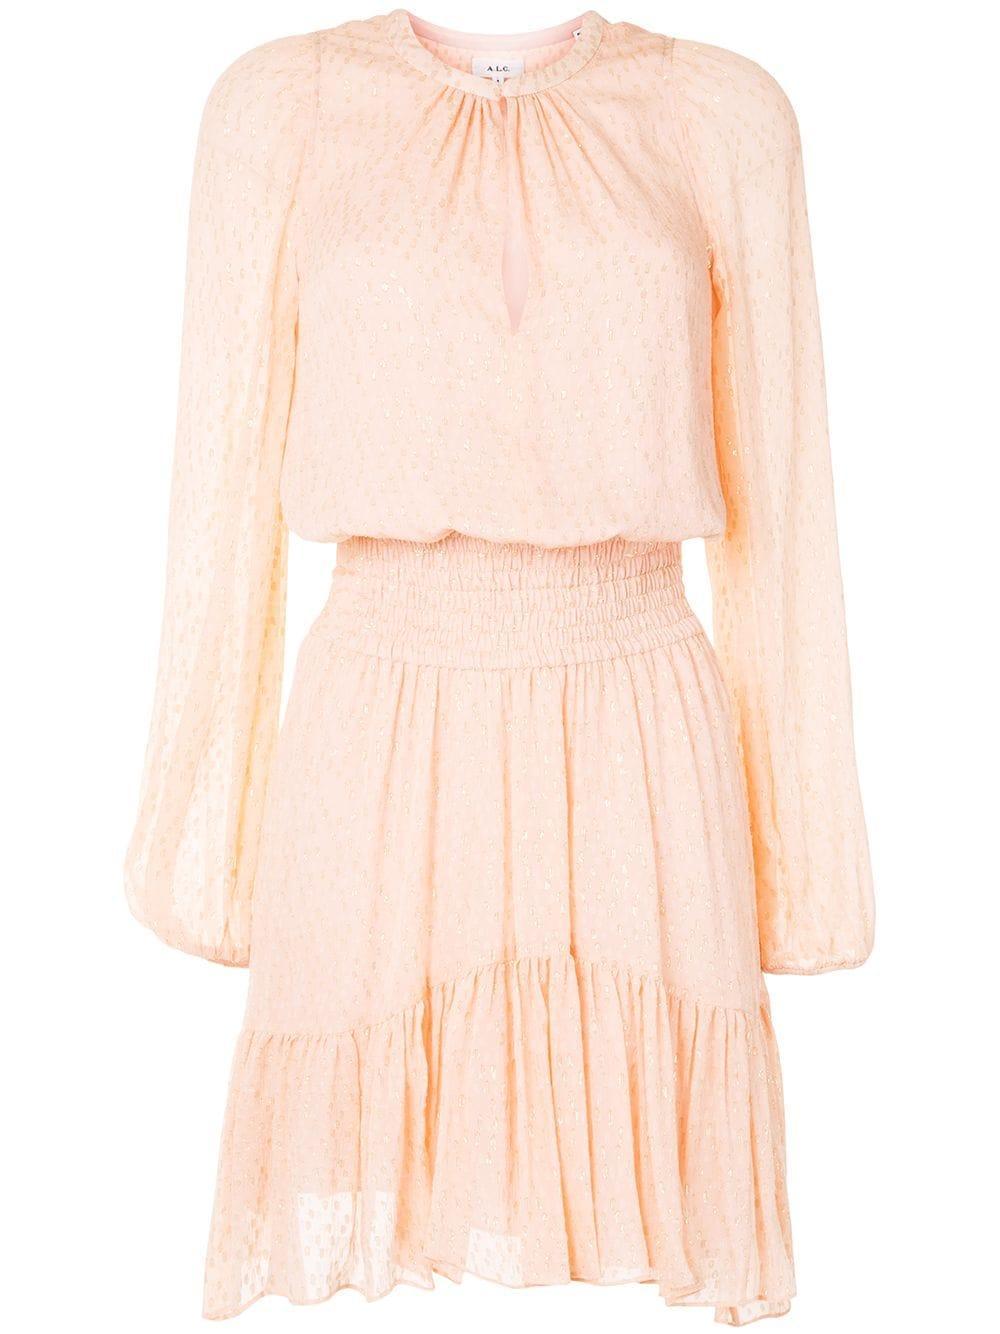 Sidney Dress